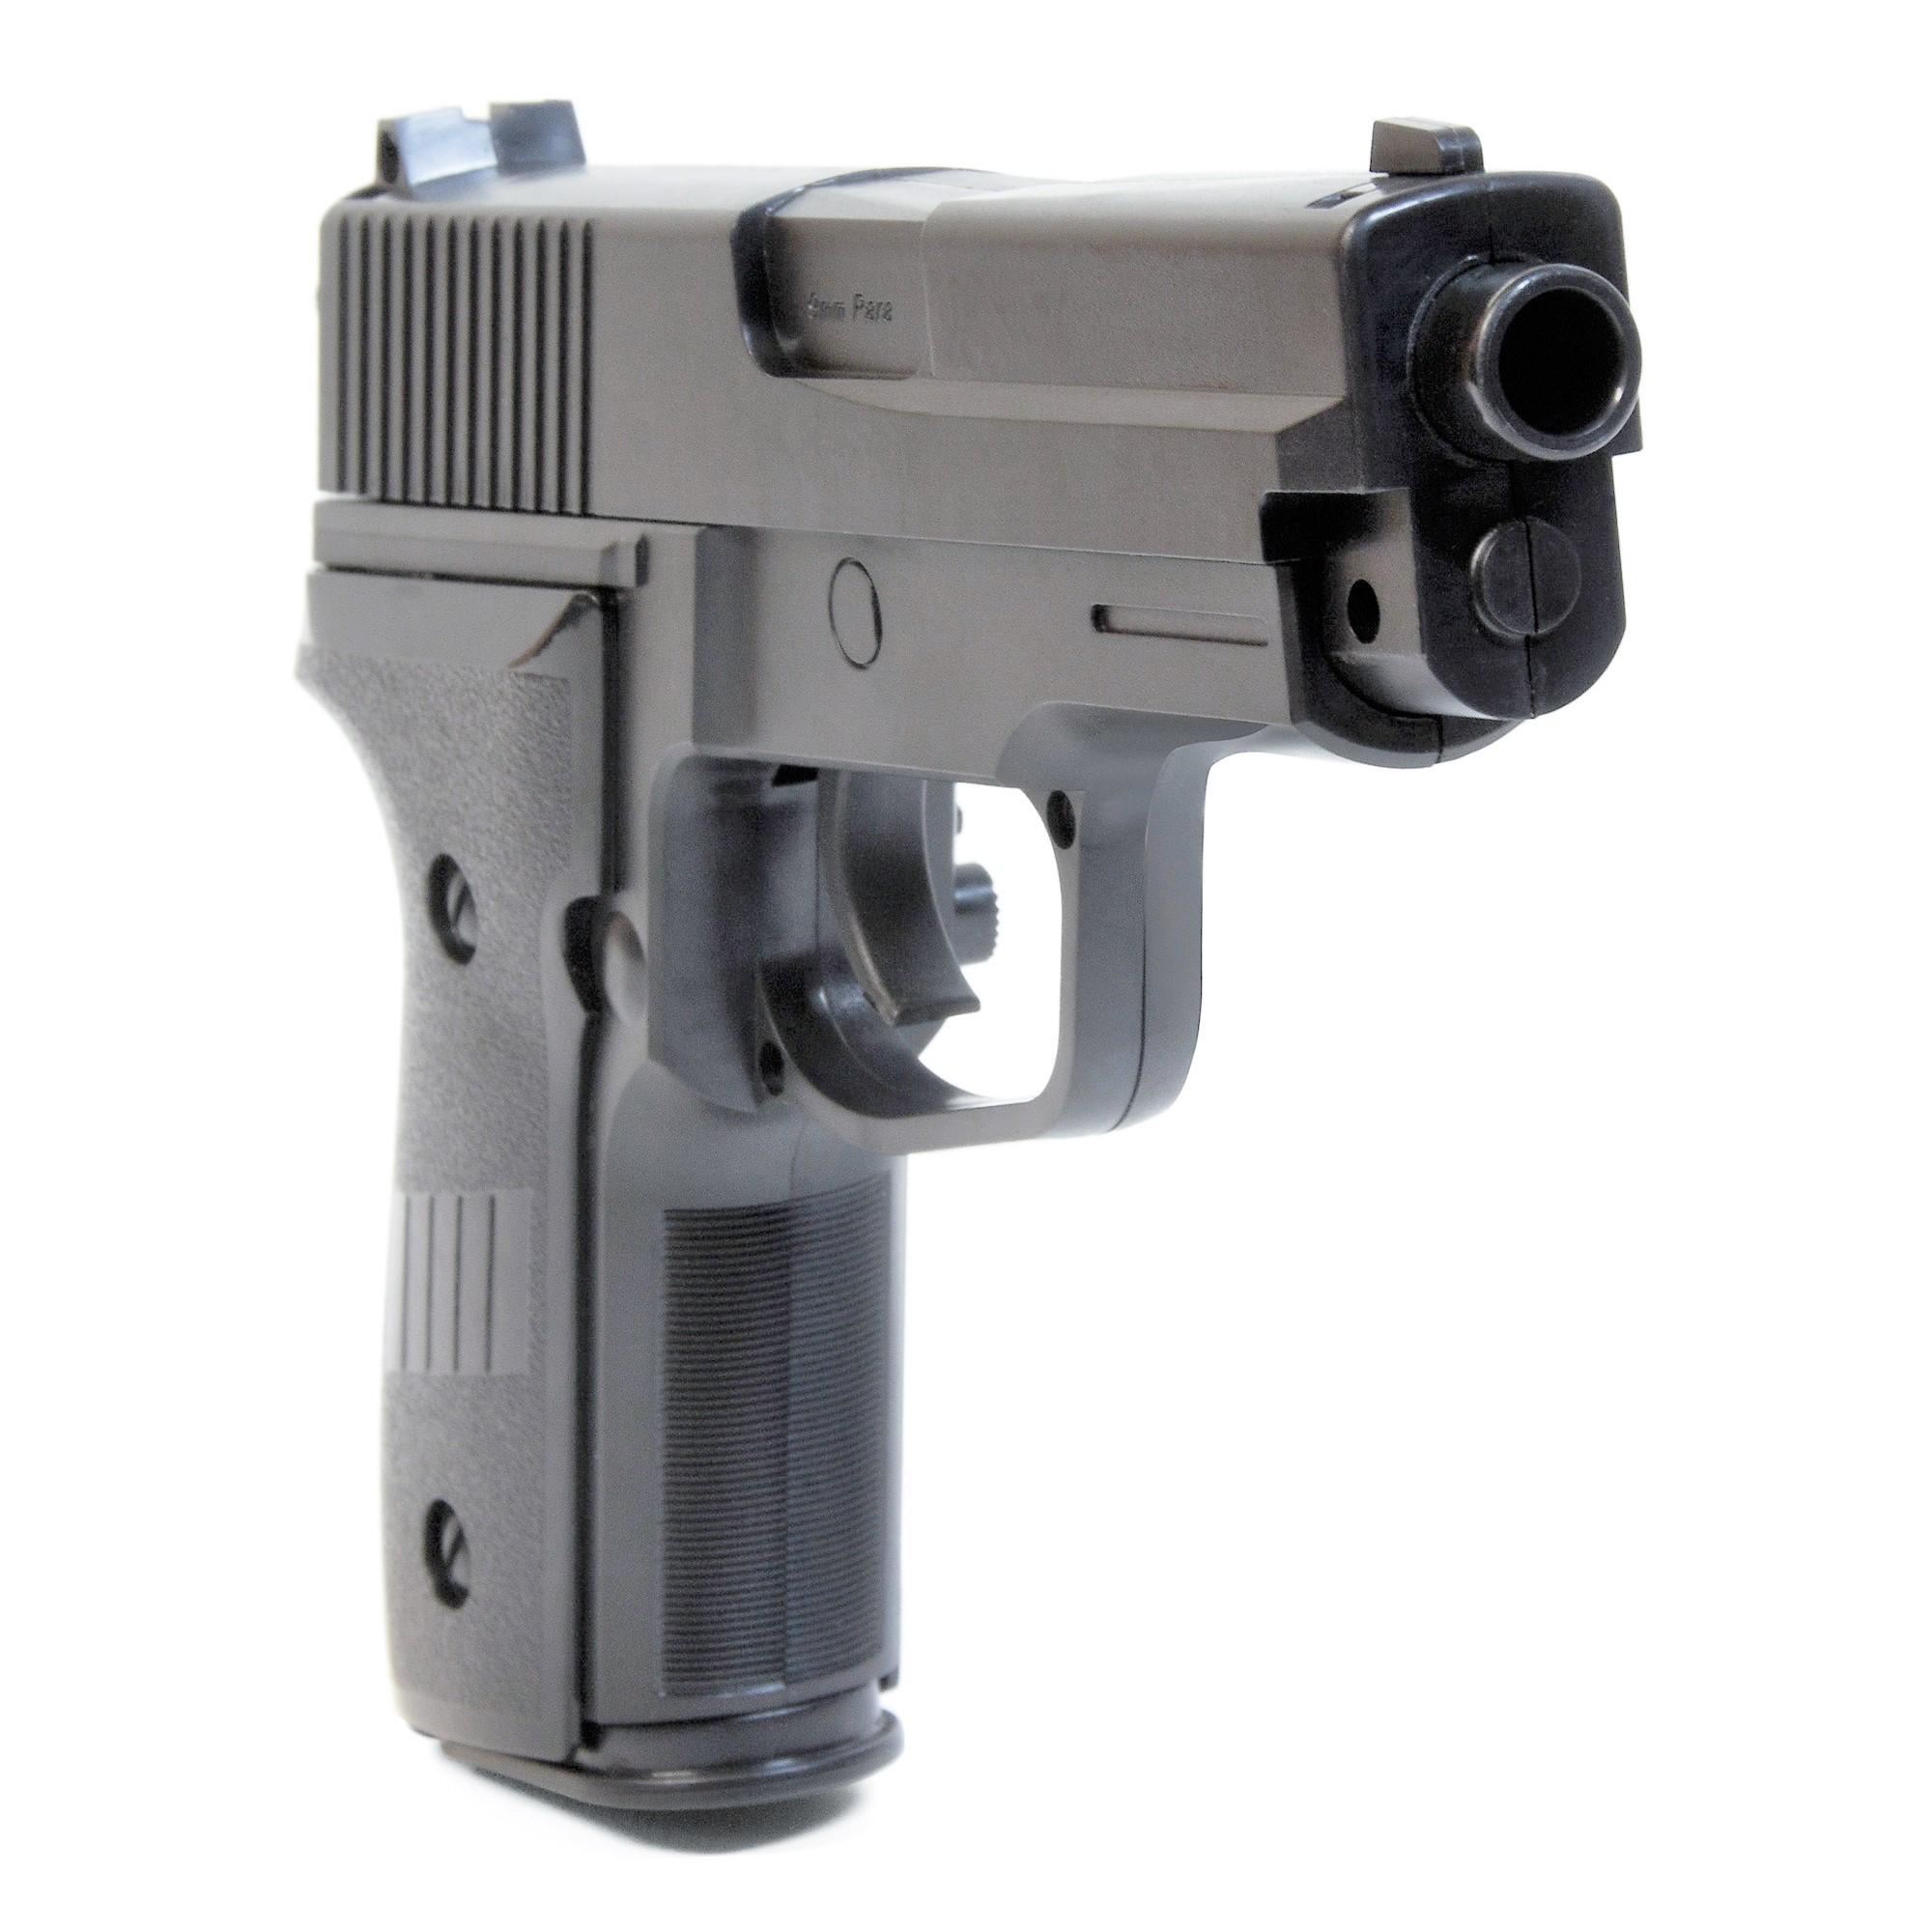 1000 BB Pistole Waffen Federdruck Softair Plastic Kugel Erbsenpistole Gun 2124